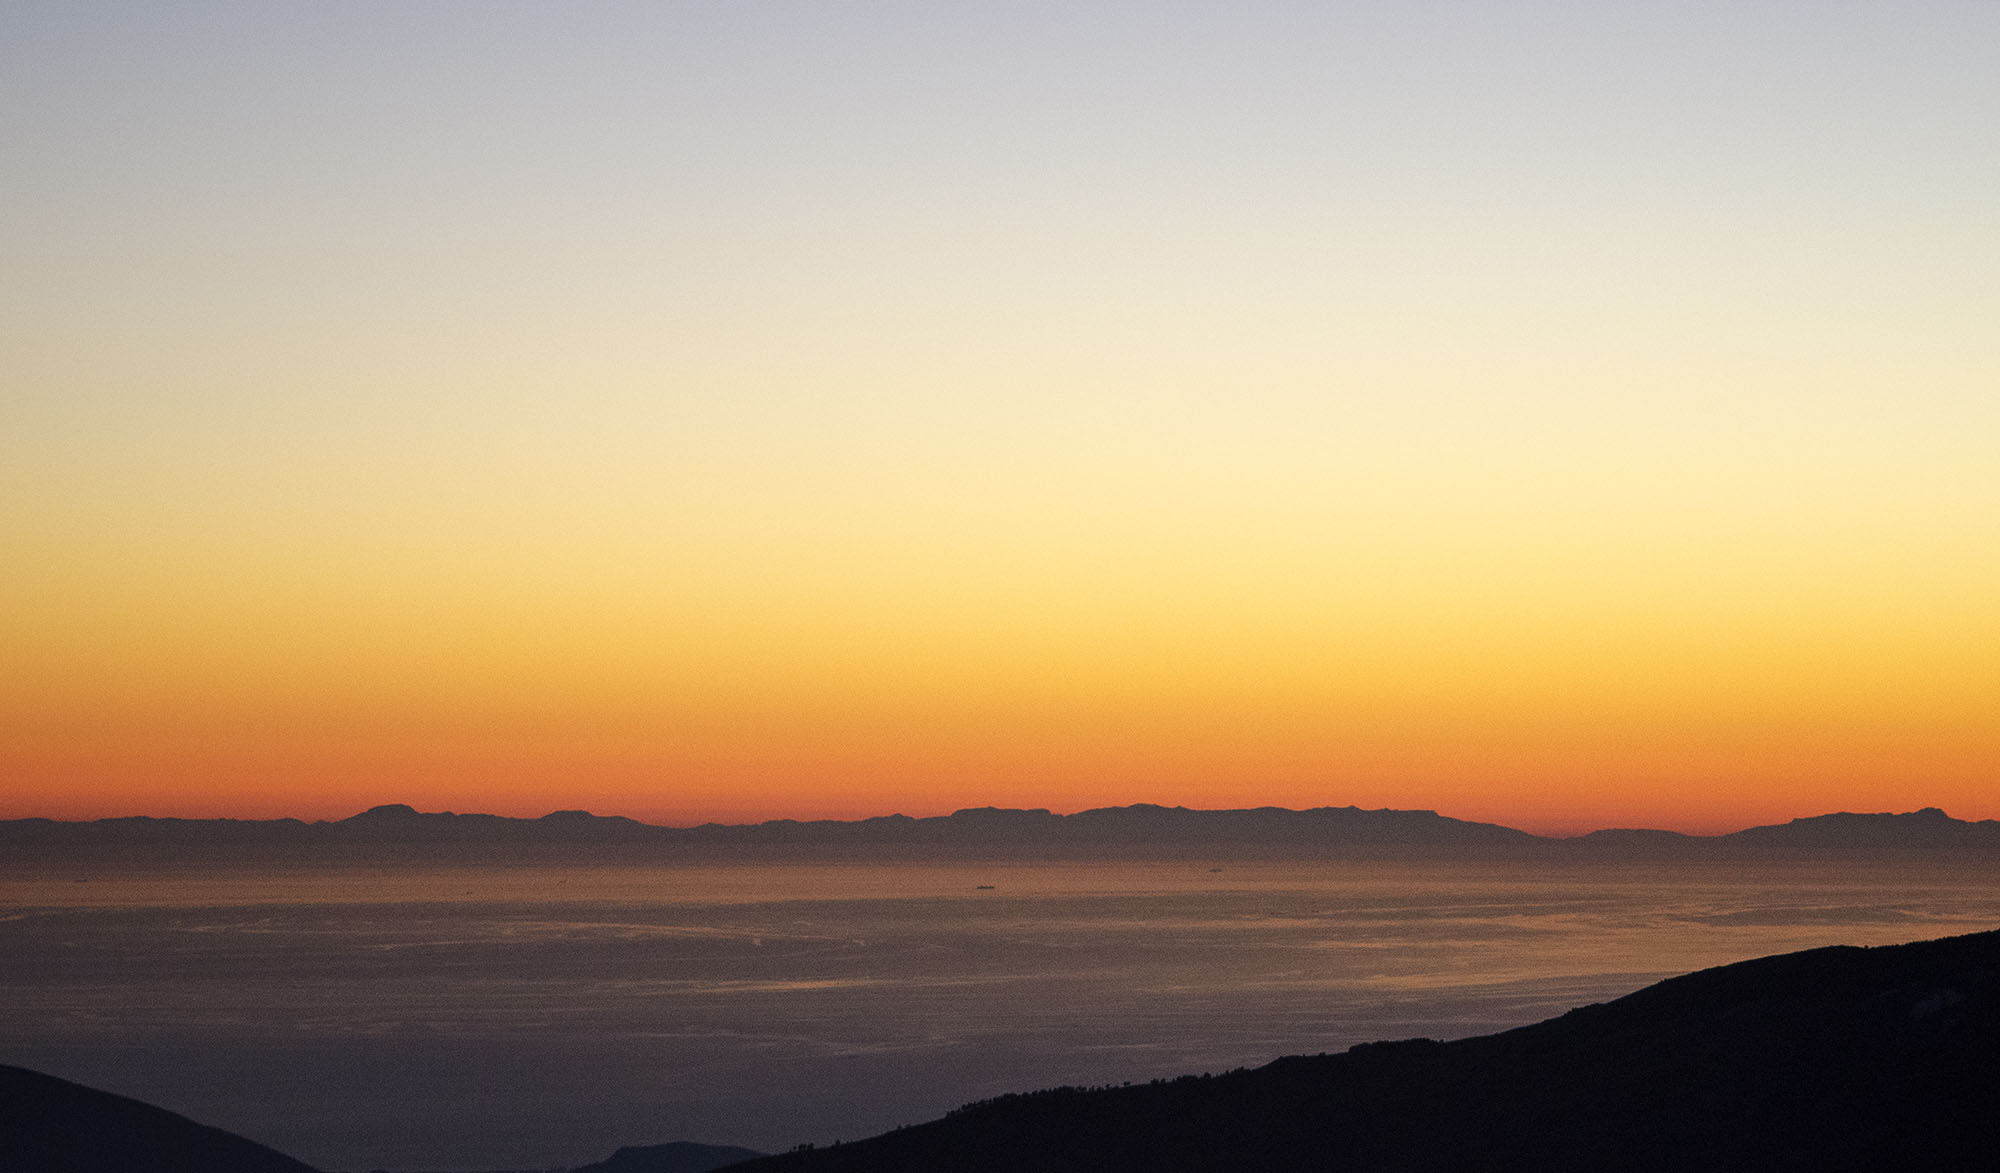 Sierra Nevada I - Mulhacen (6)